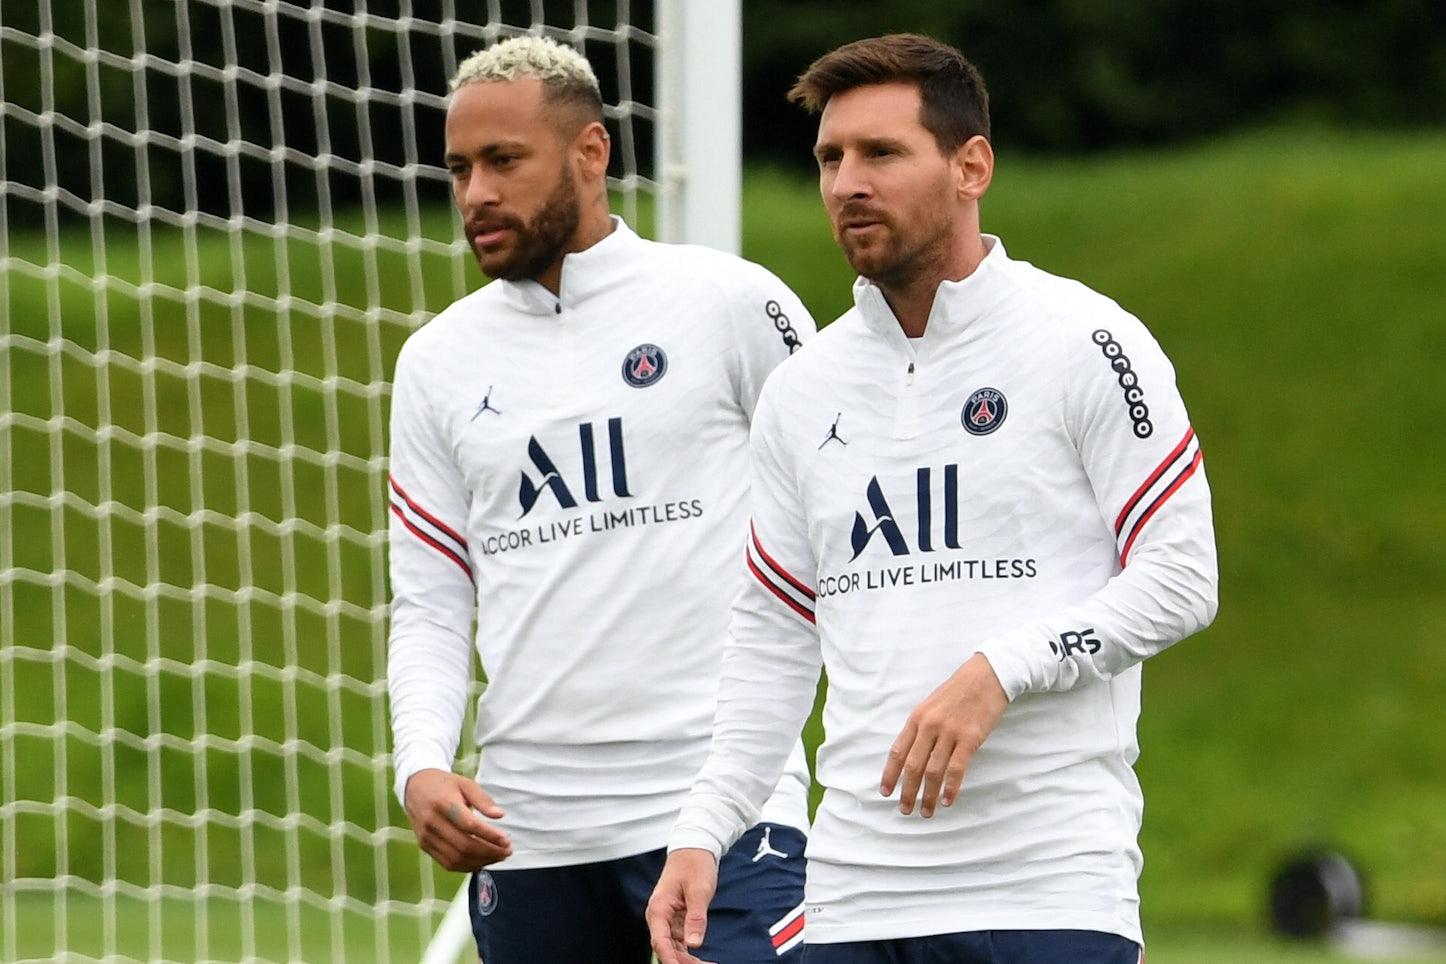 European soccer,neymar,messi,paris saint germain,Jack Grealish,Harry Kane,Romelu Lukaku,123news